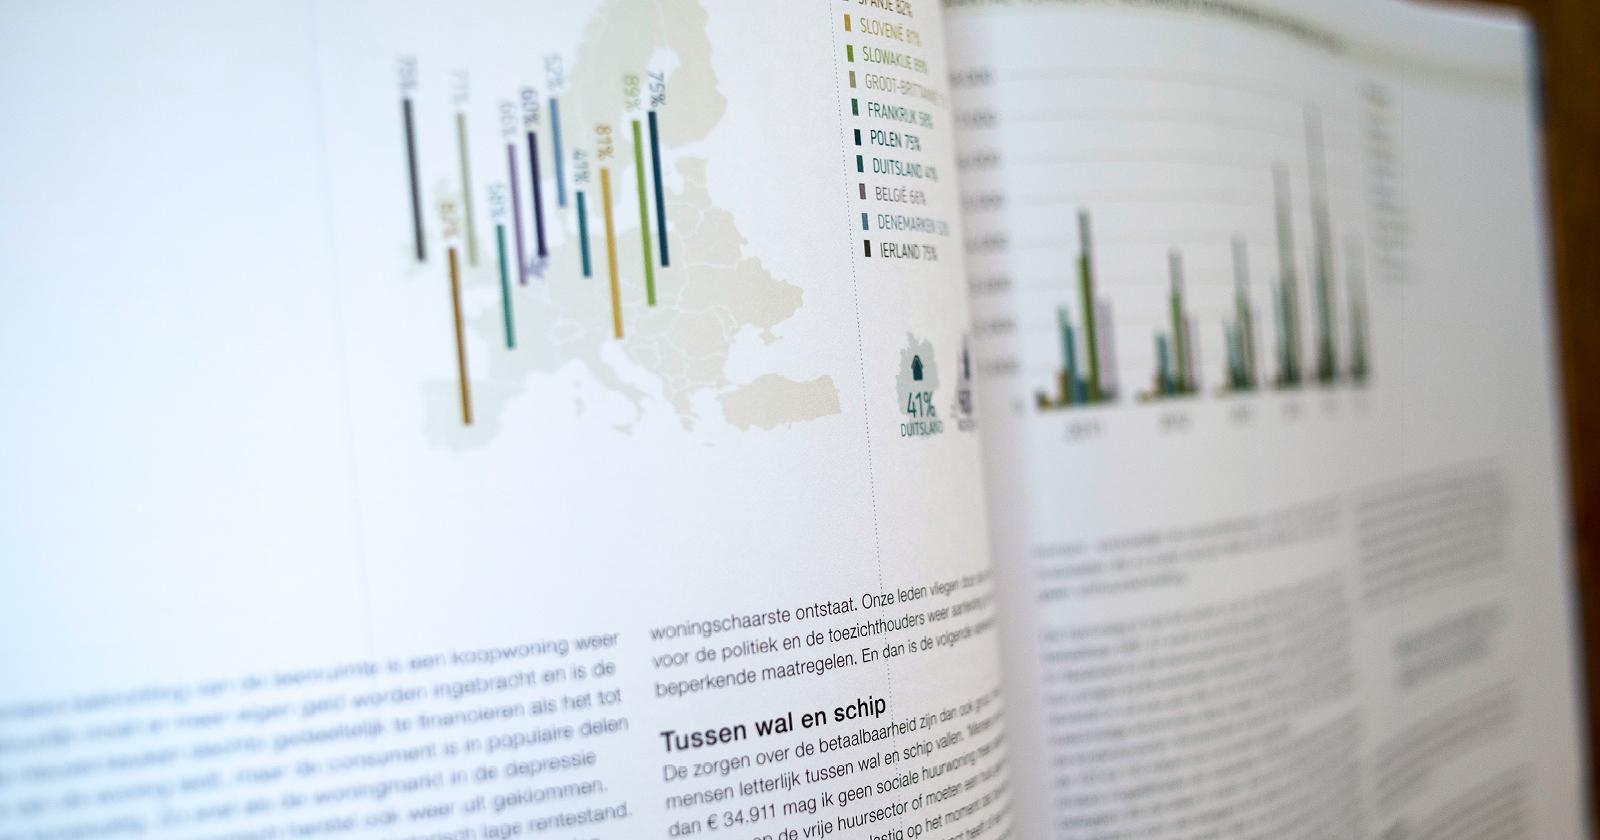 info-cartografics6-PubliekGeheim